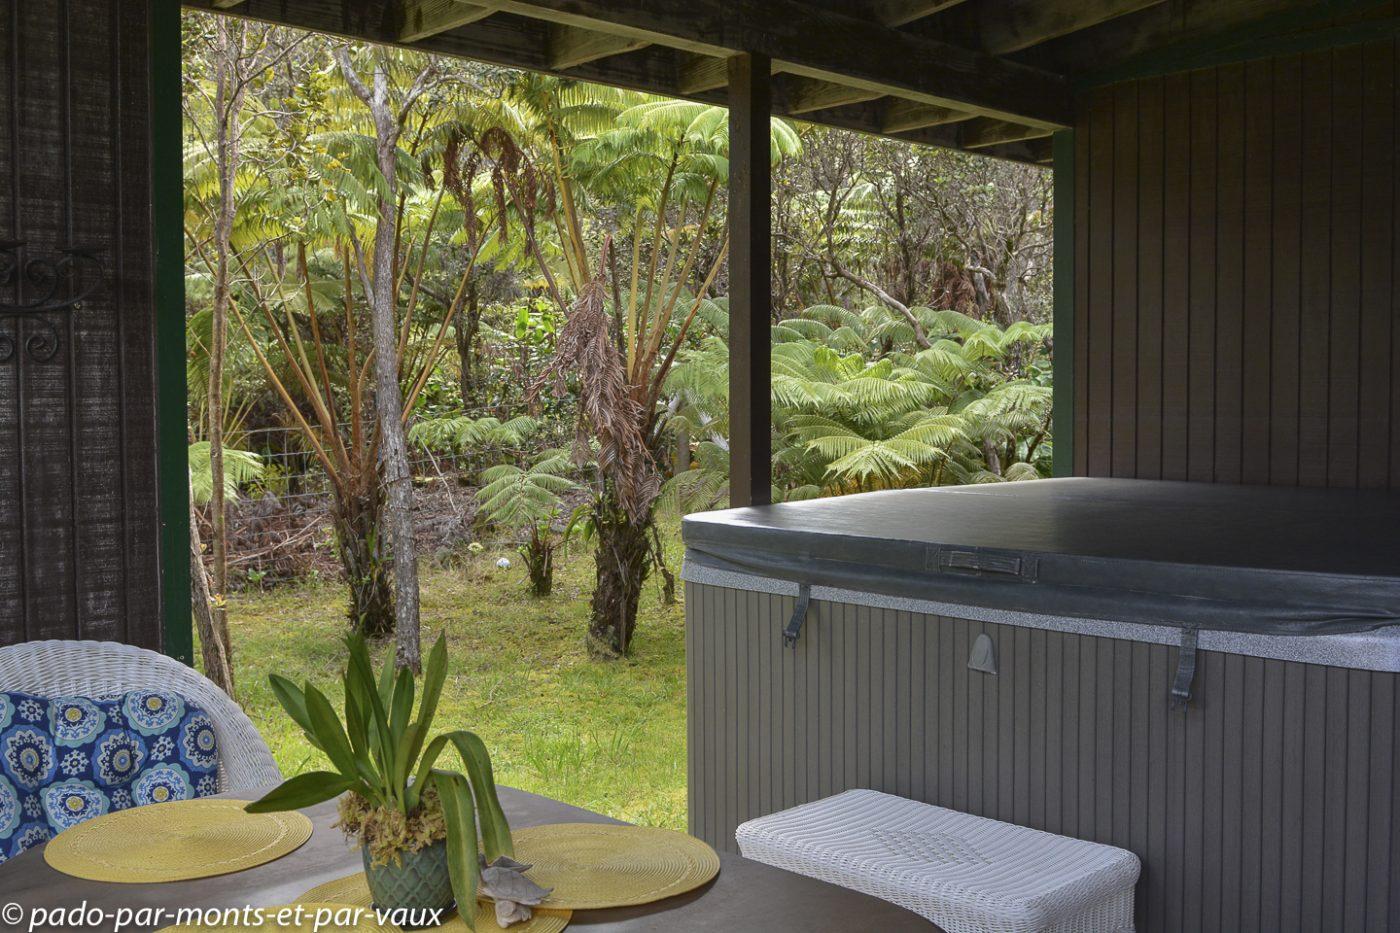 Big Island - Paniolo cottage - le jacuzzi